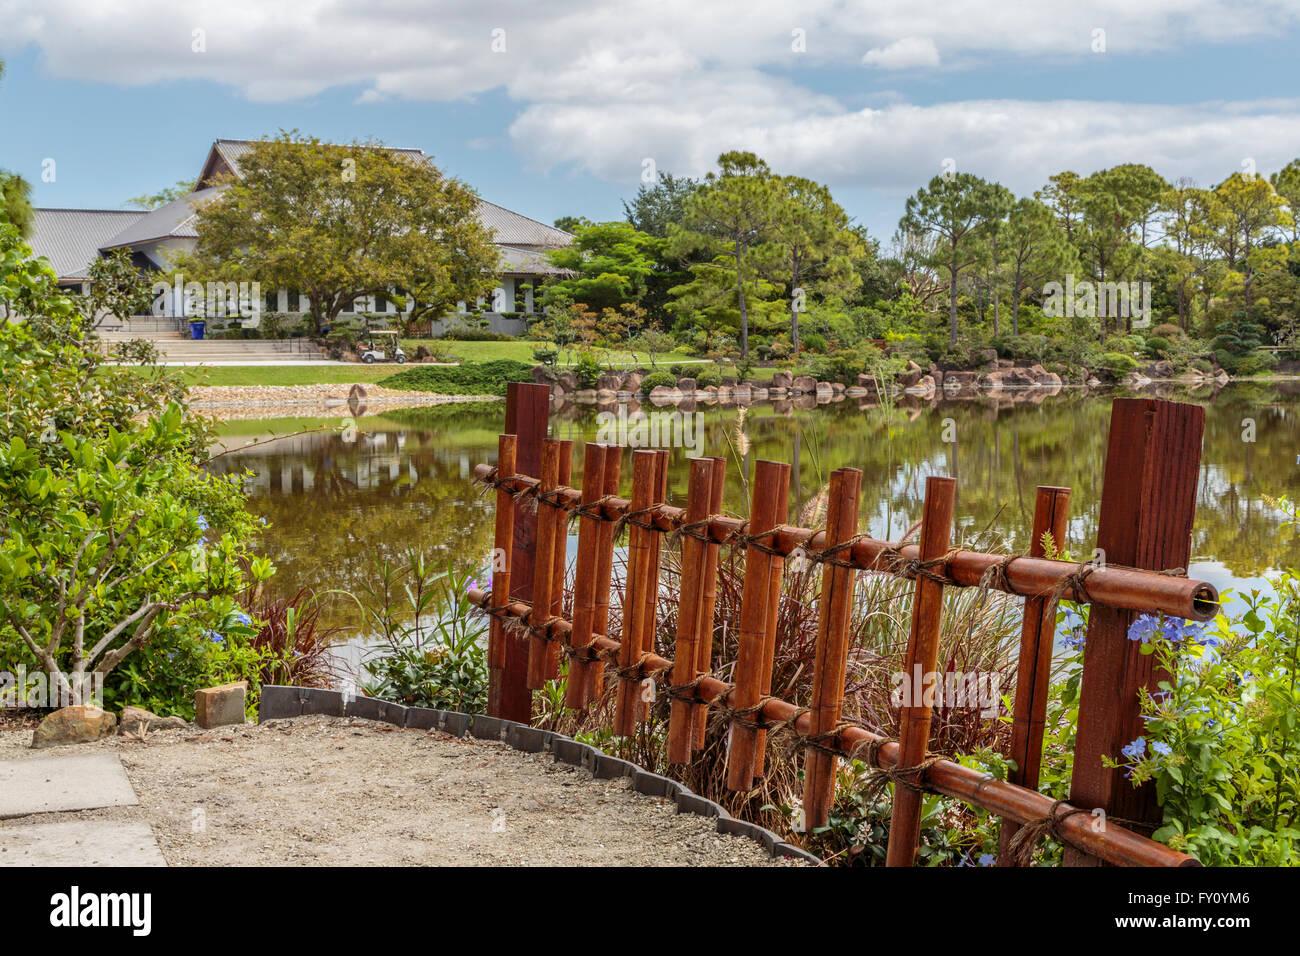 Morikami Japanese Gardens Stock Photos & Morikami Japanese Gardens ...